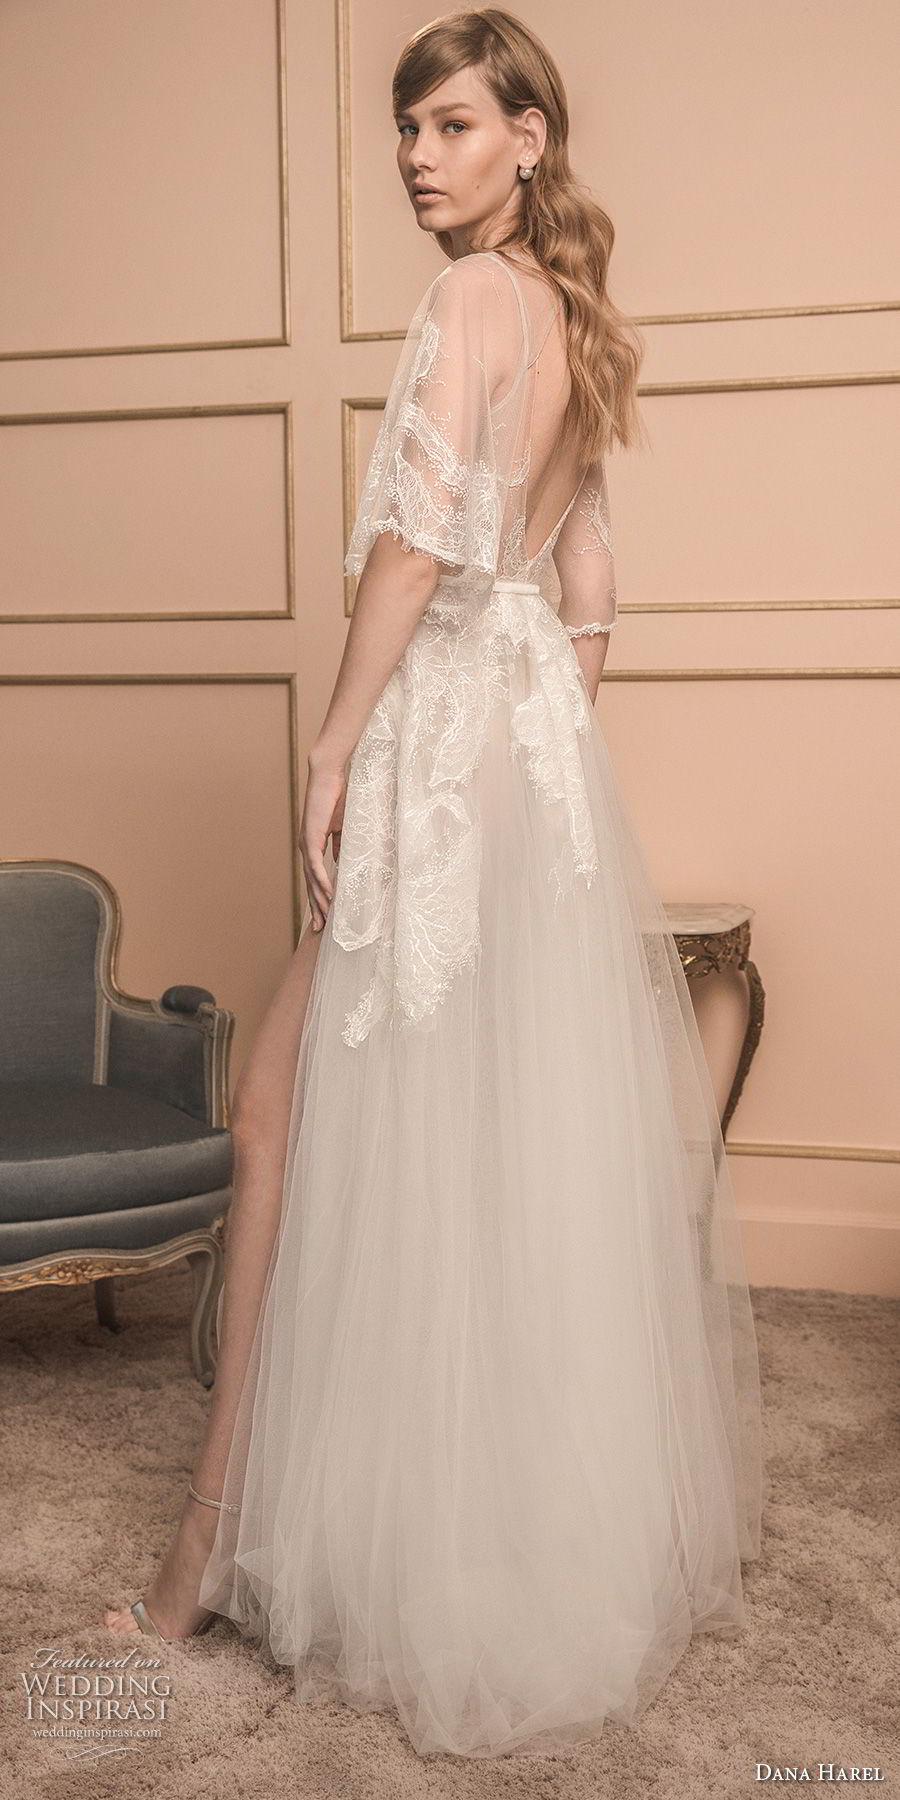 dana harel 2018 bridal half bell sleeves illusion jewel neck heavily embellished bodice high slit skirt romantic a line wedding dress v back sweep train (4) sdv